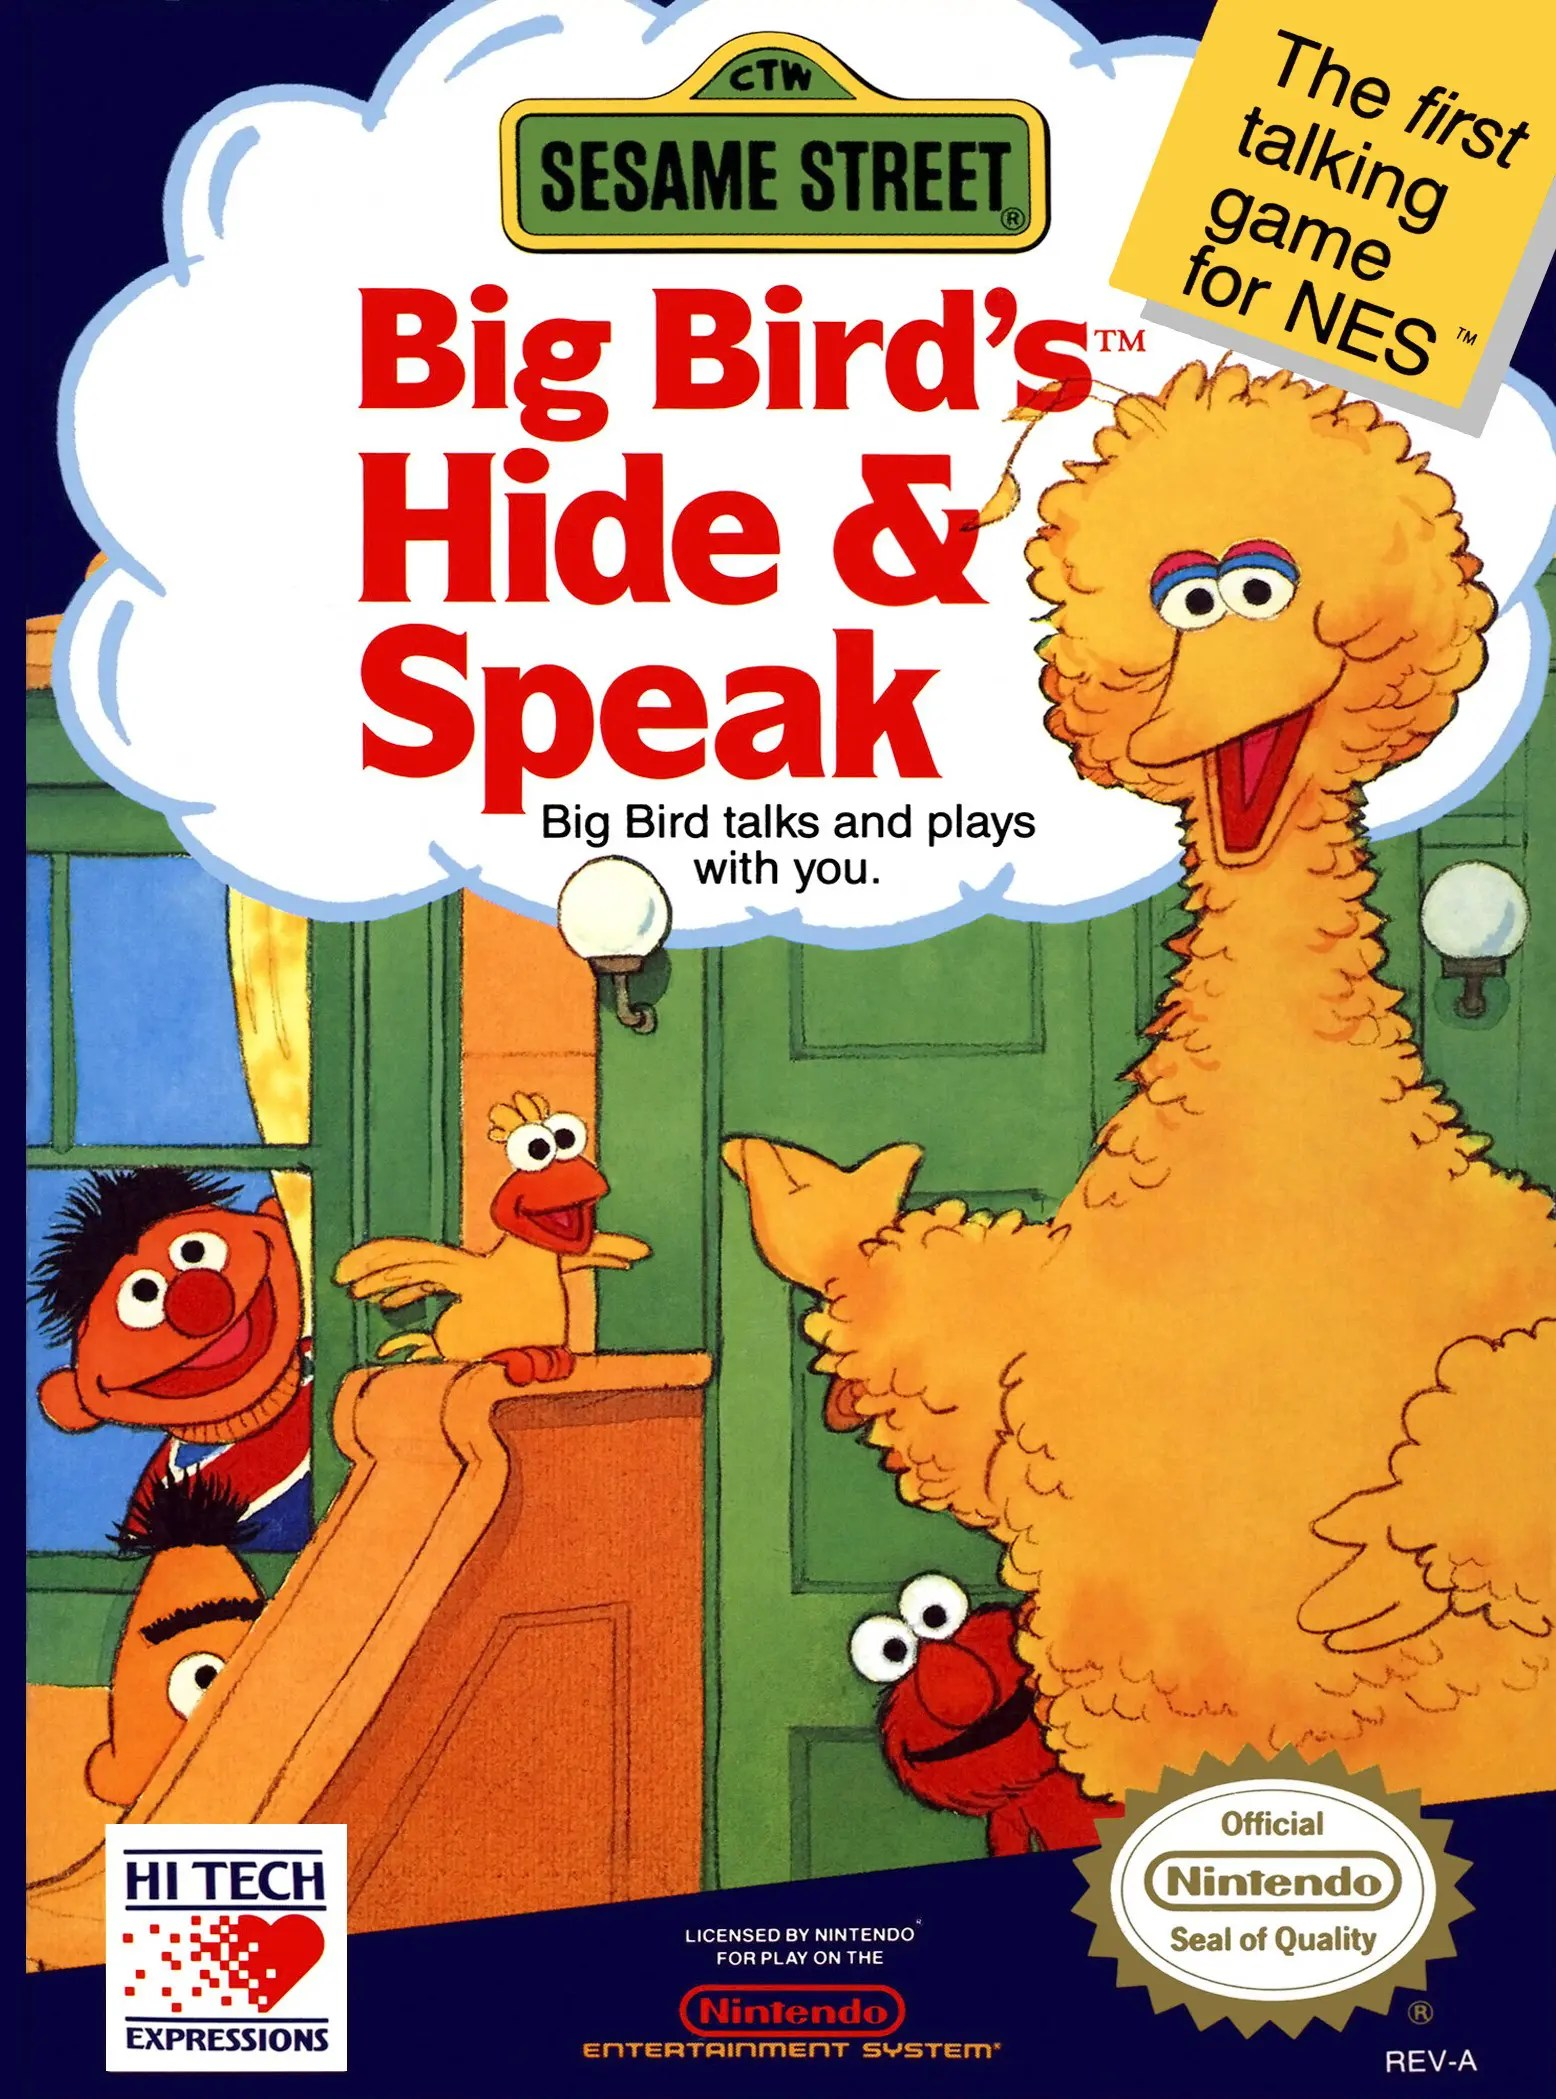 Sesame Street: Big Bird's Hide & Speak for Nintendo Entertainment System (NES)